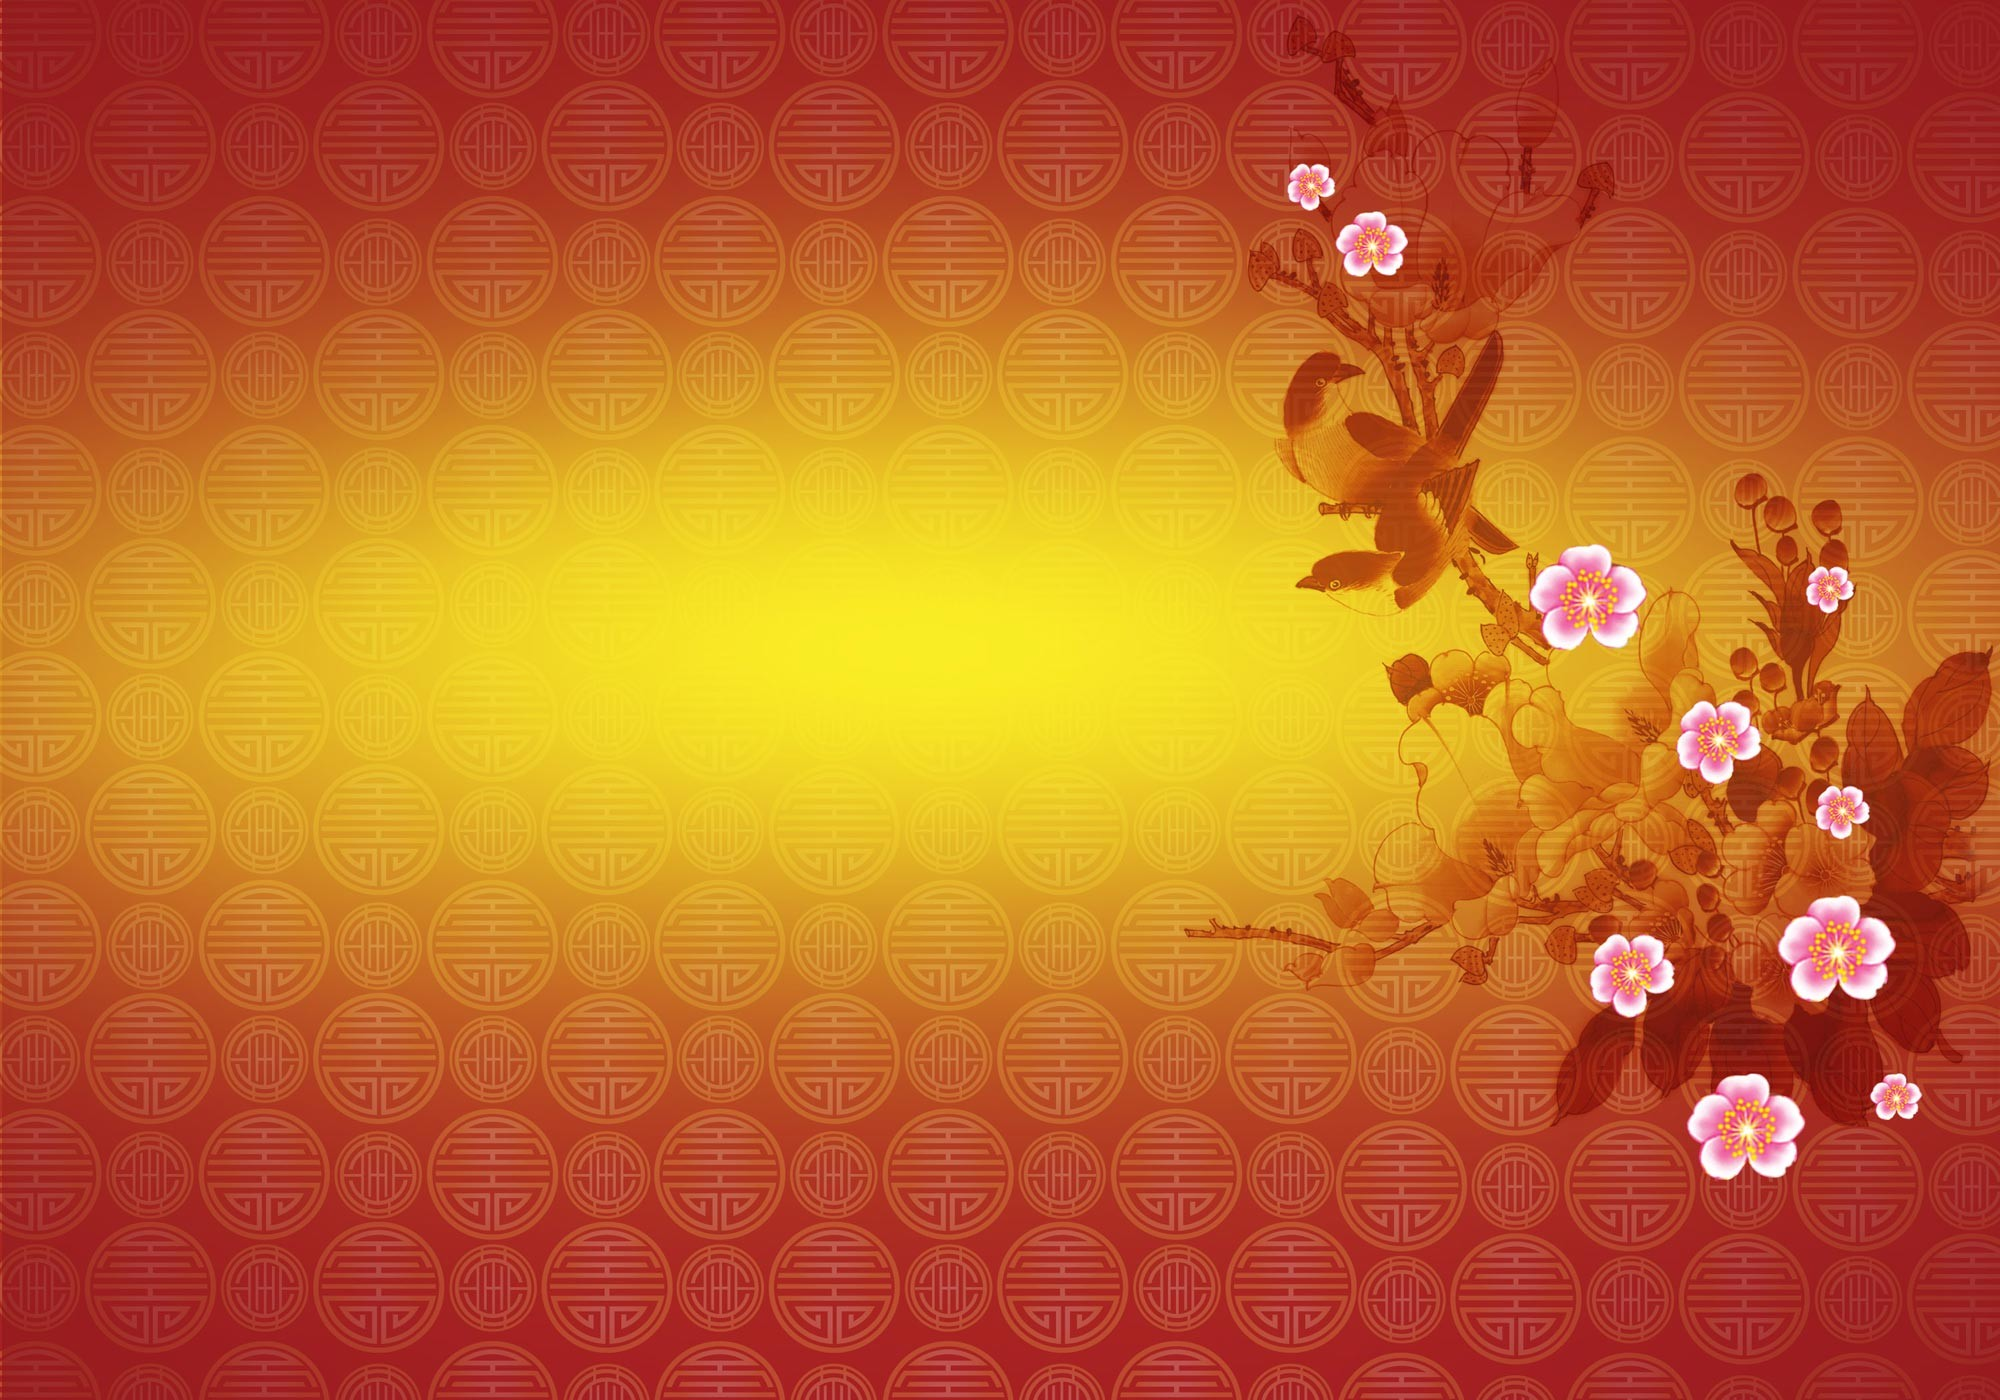 Lanterns Wallpaper Hd Chinese Backgrounds 183 ①